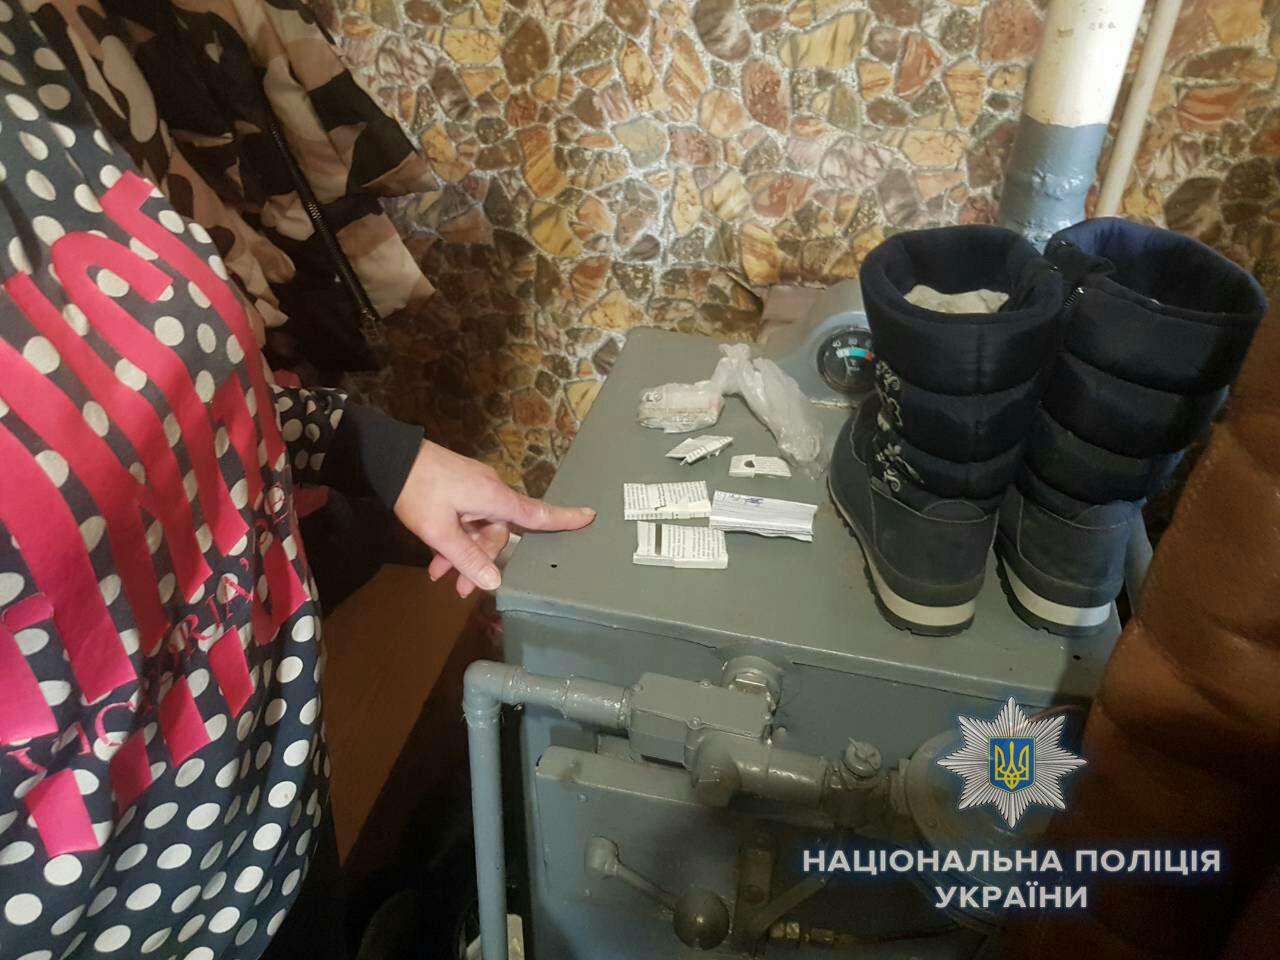 В Дружковке мать двоих детей хранила дома наркотики (ФОТО), фото-1